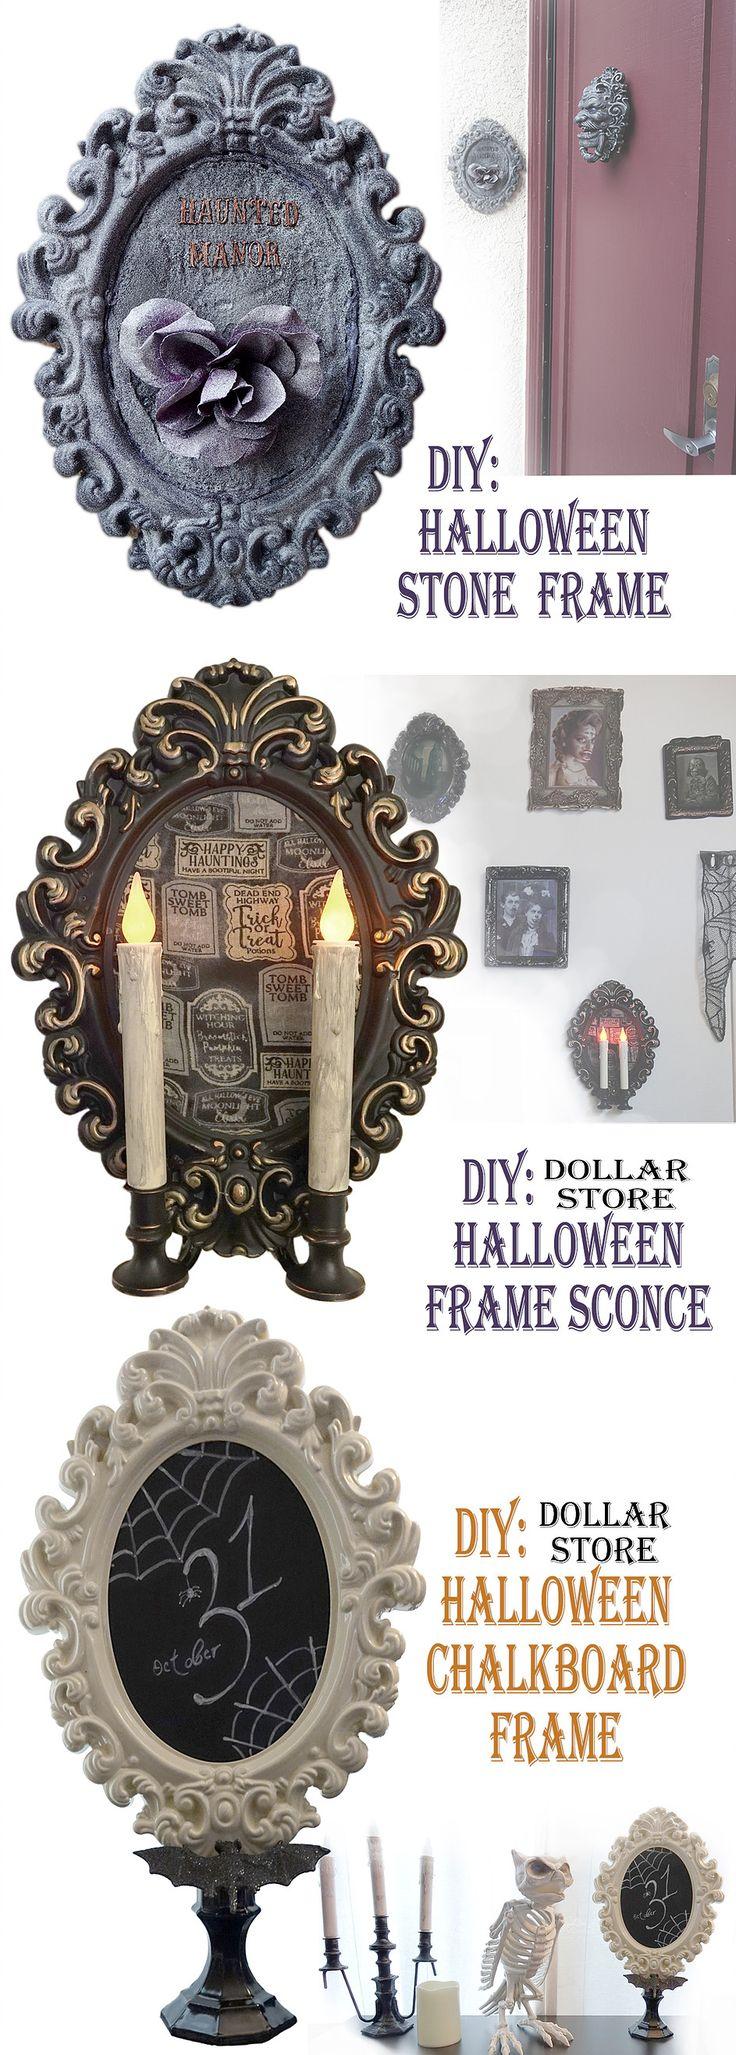 574 Best Halloween Images On Pinterest Embroidery Skulls And Stitches Led Lantern Flicker Circuit Hauntforumcom Dollar Store Frame 3 Diys